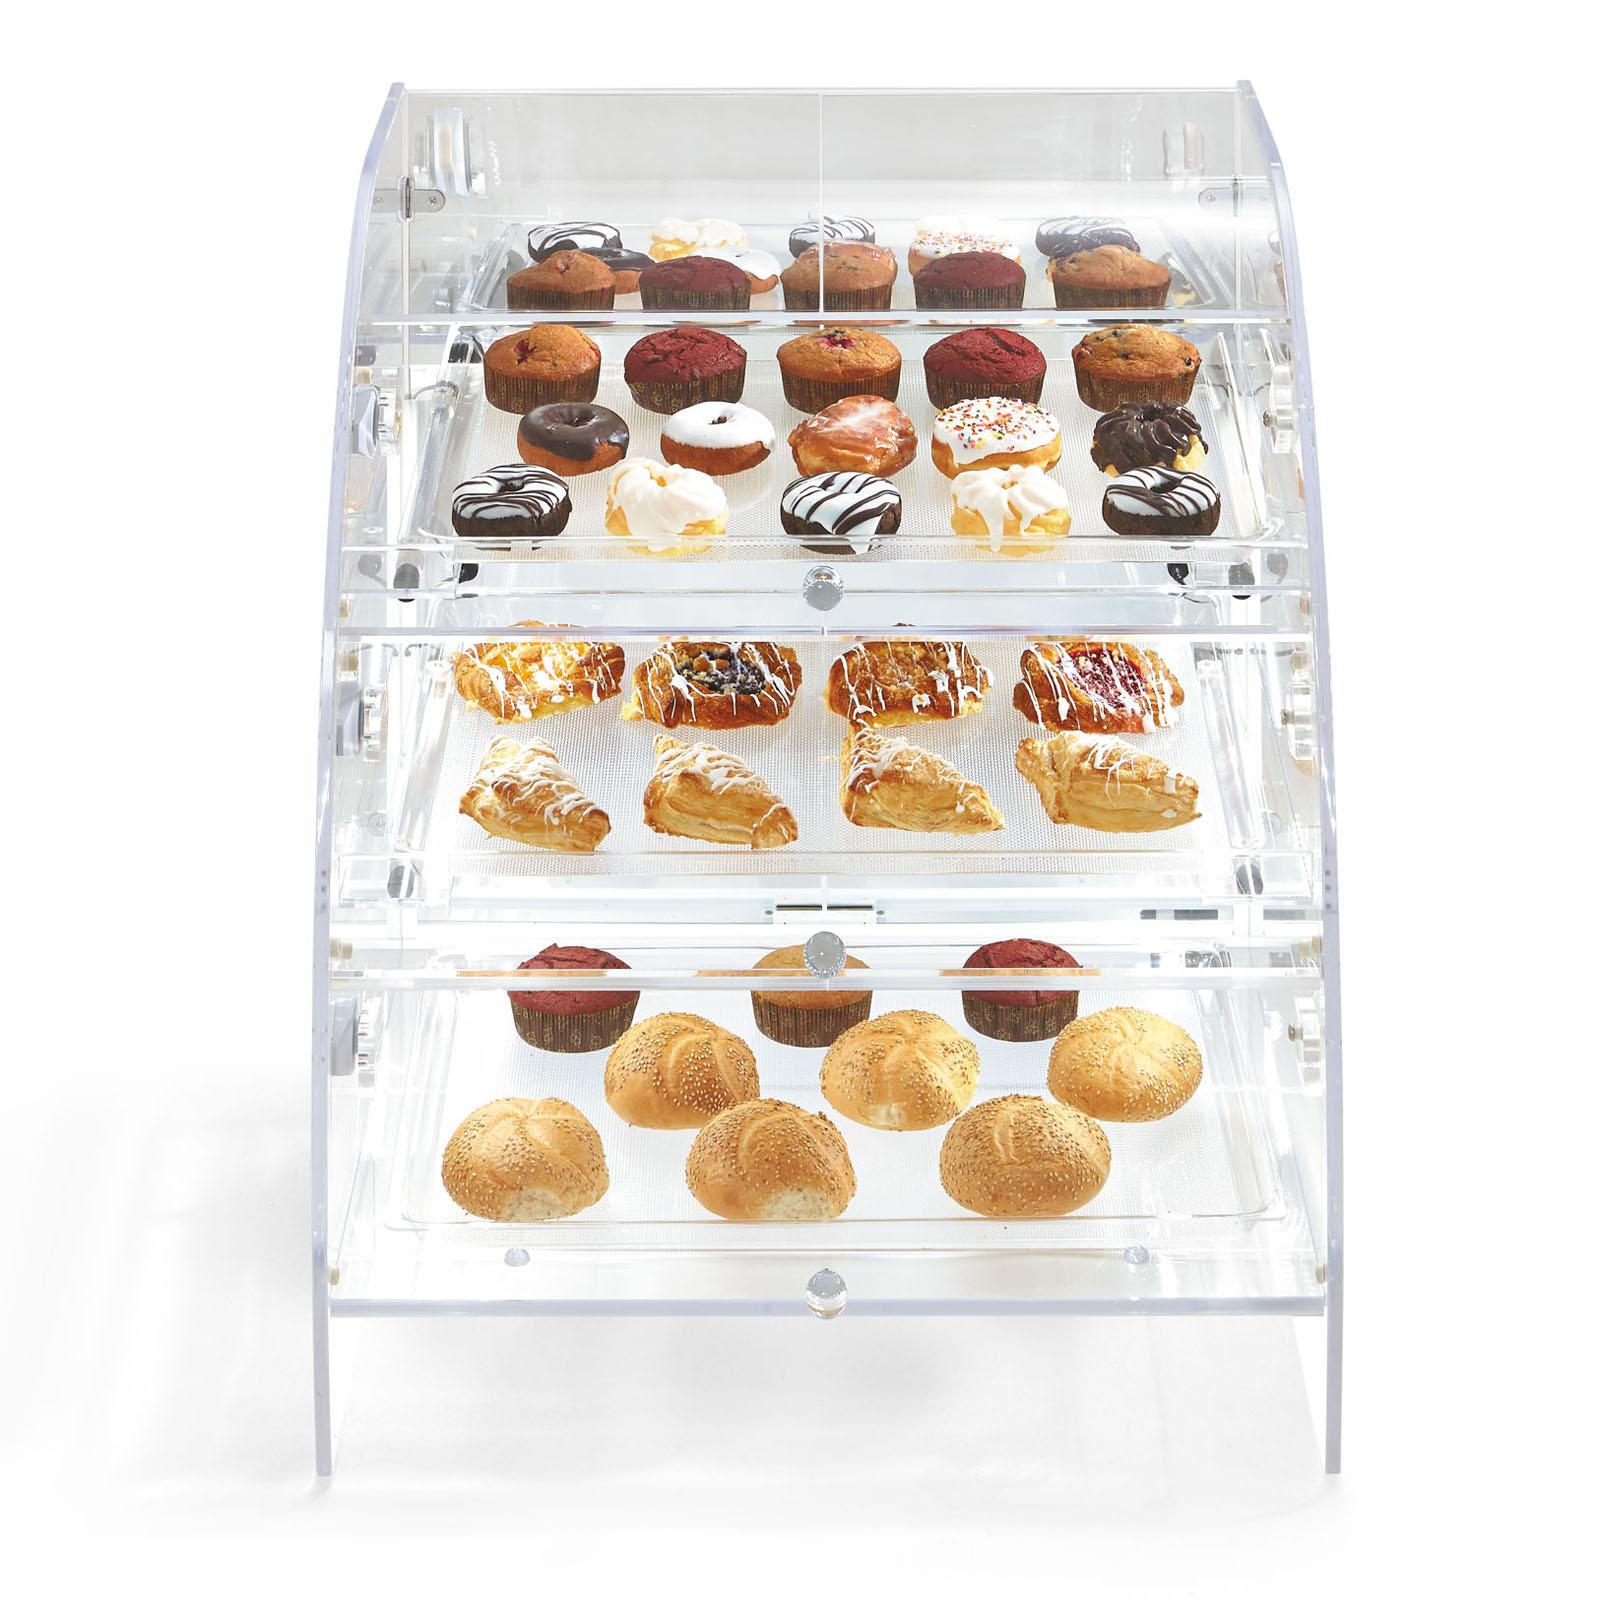 Vollrath XLBC3R-1826-13 display case, pastry, countertop